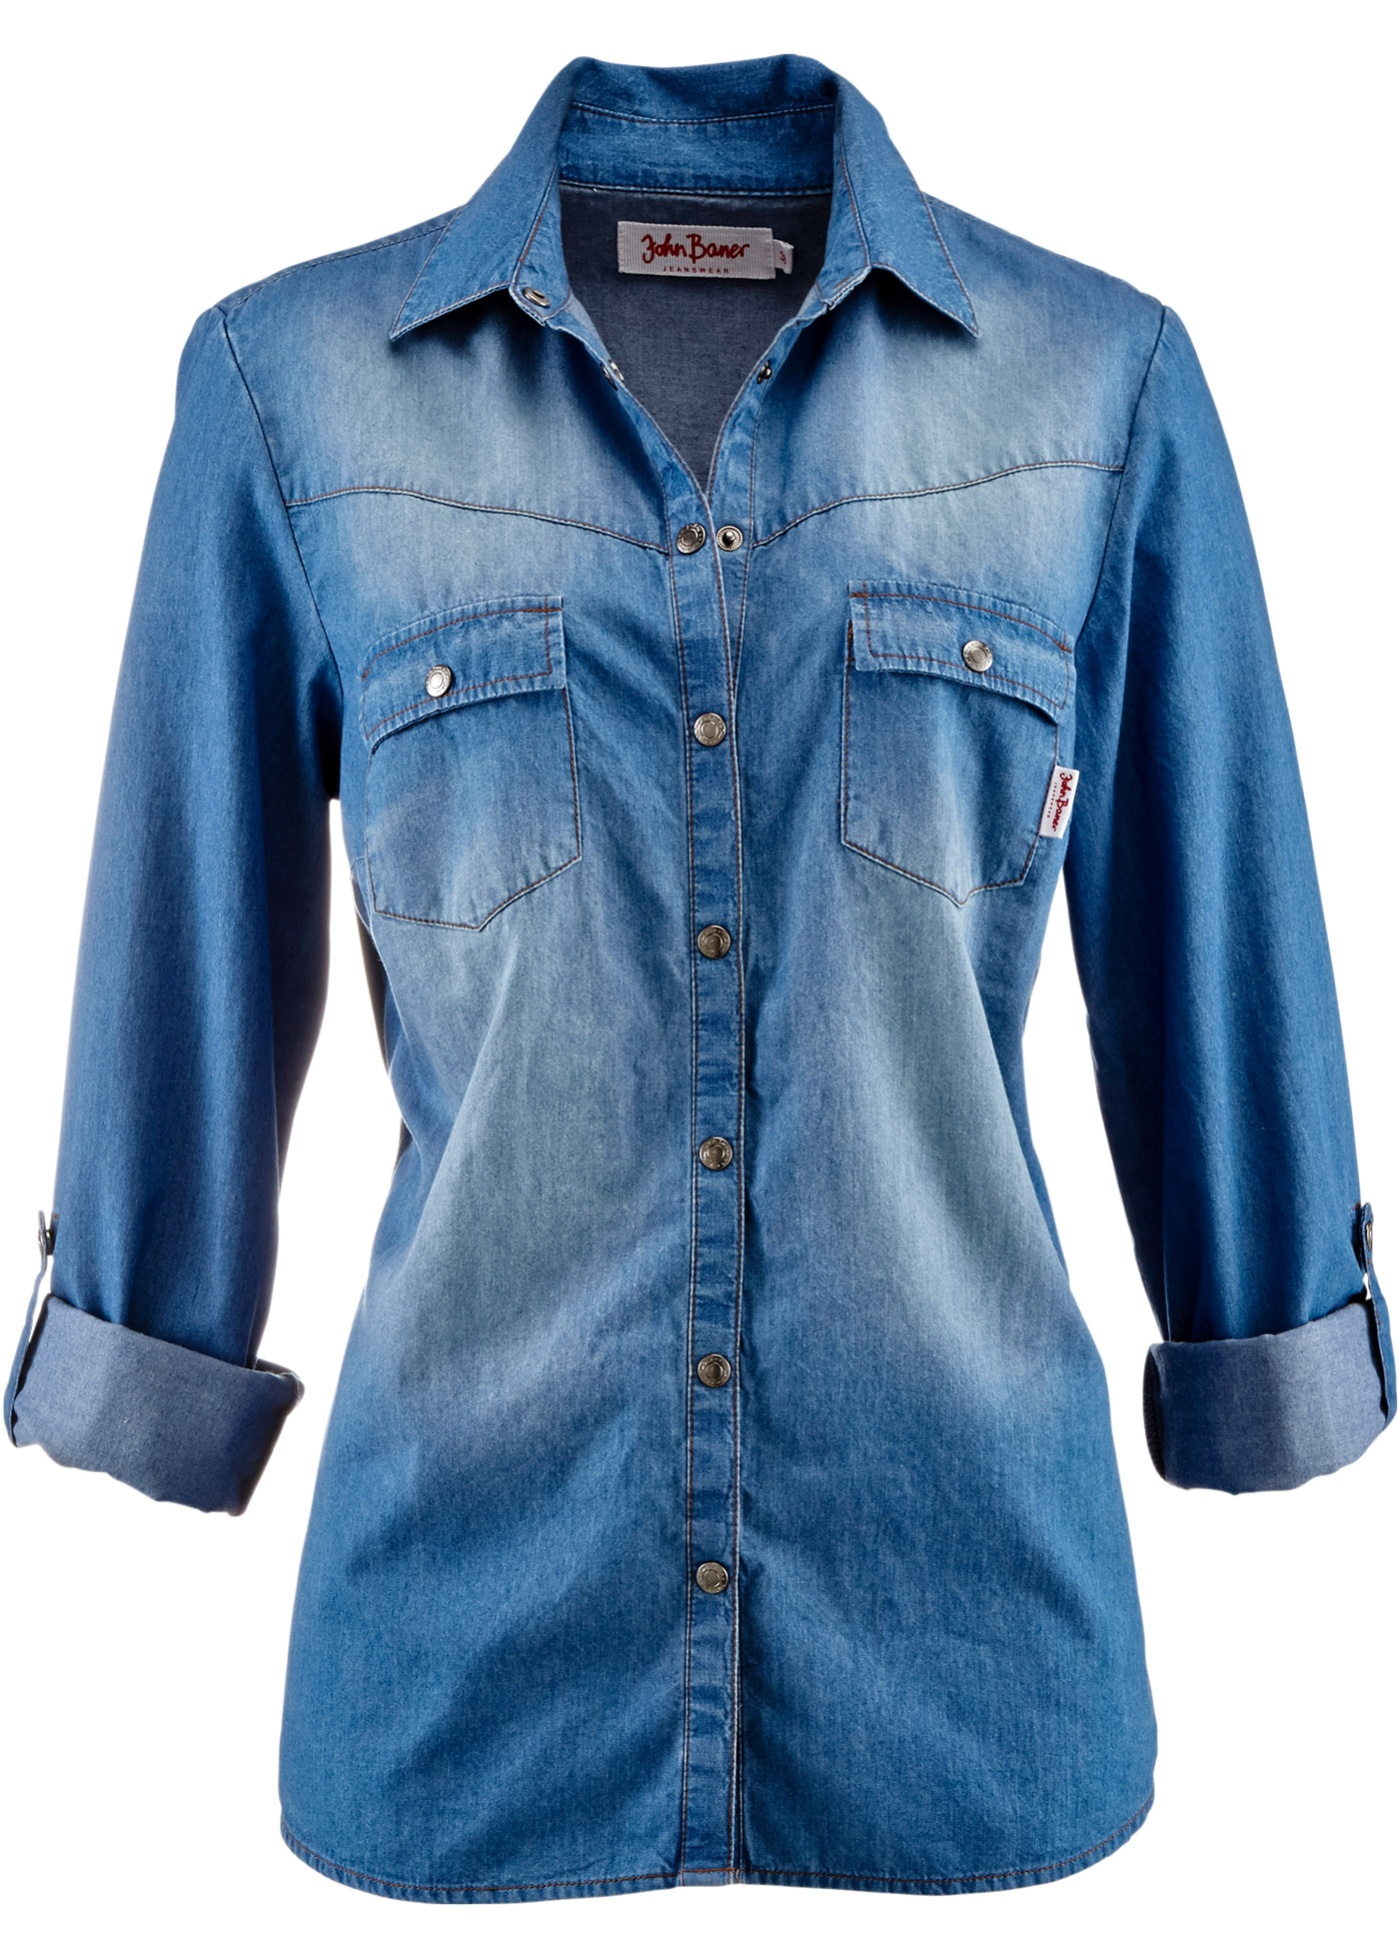 BonprixChemise Baner Pour Bleu Jeanswear Longues John Jean Manches Femme En Fl1JKc